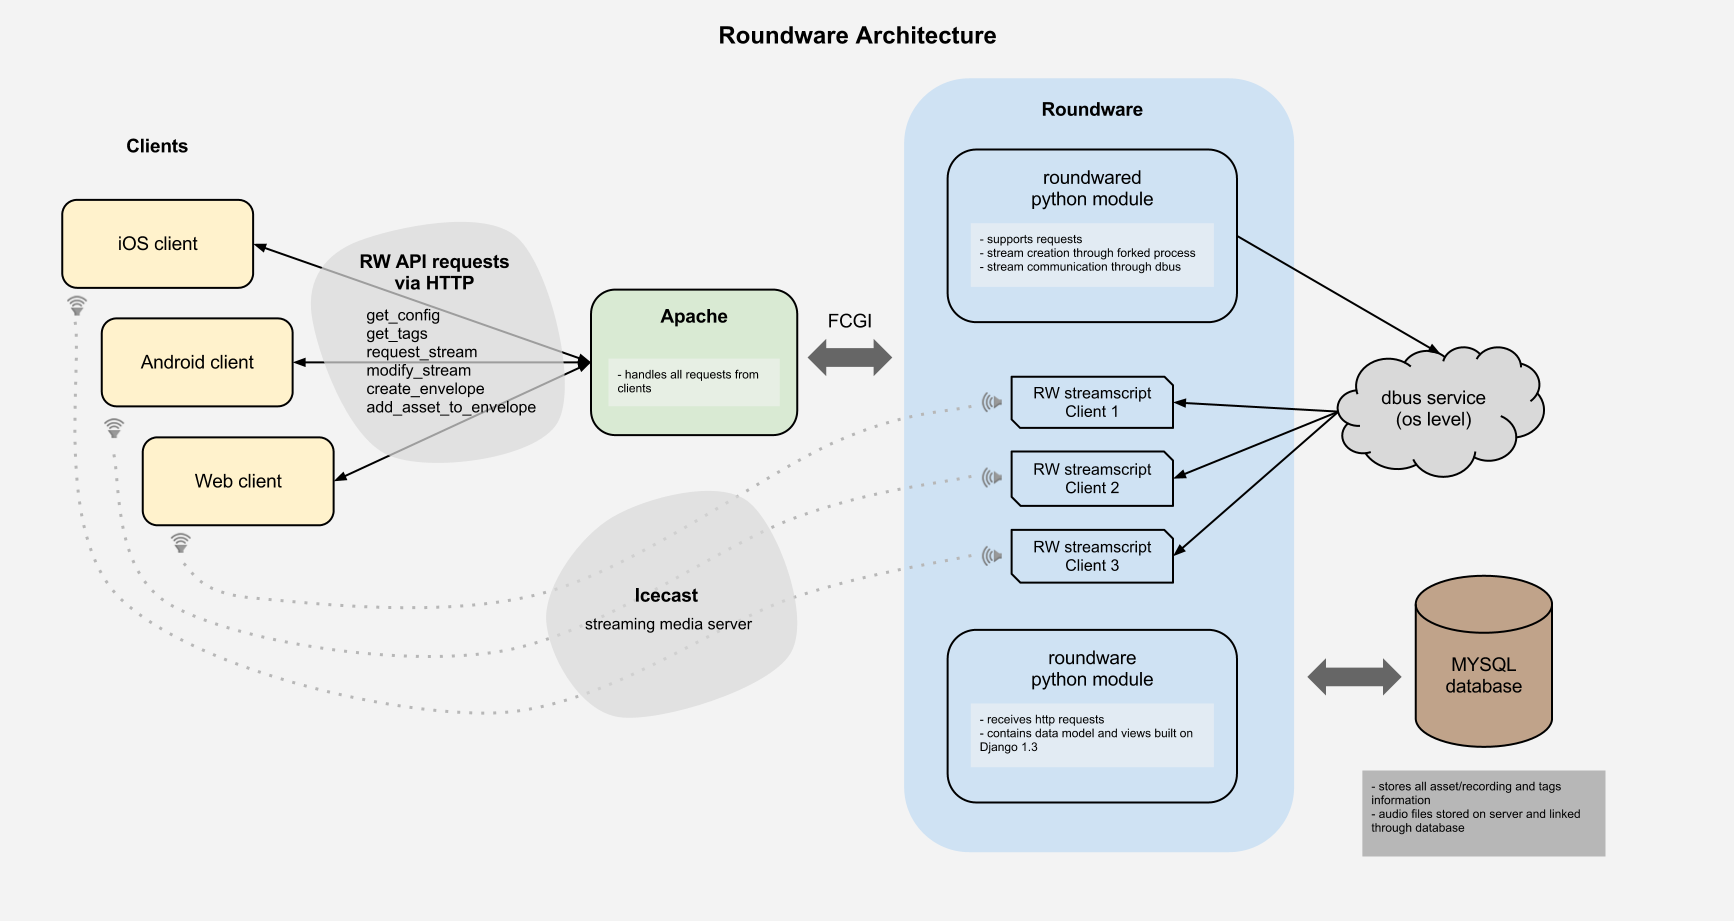 Architecture - Roundware Documentation